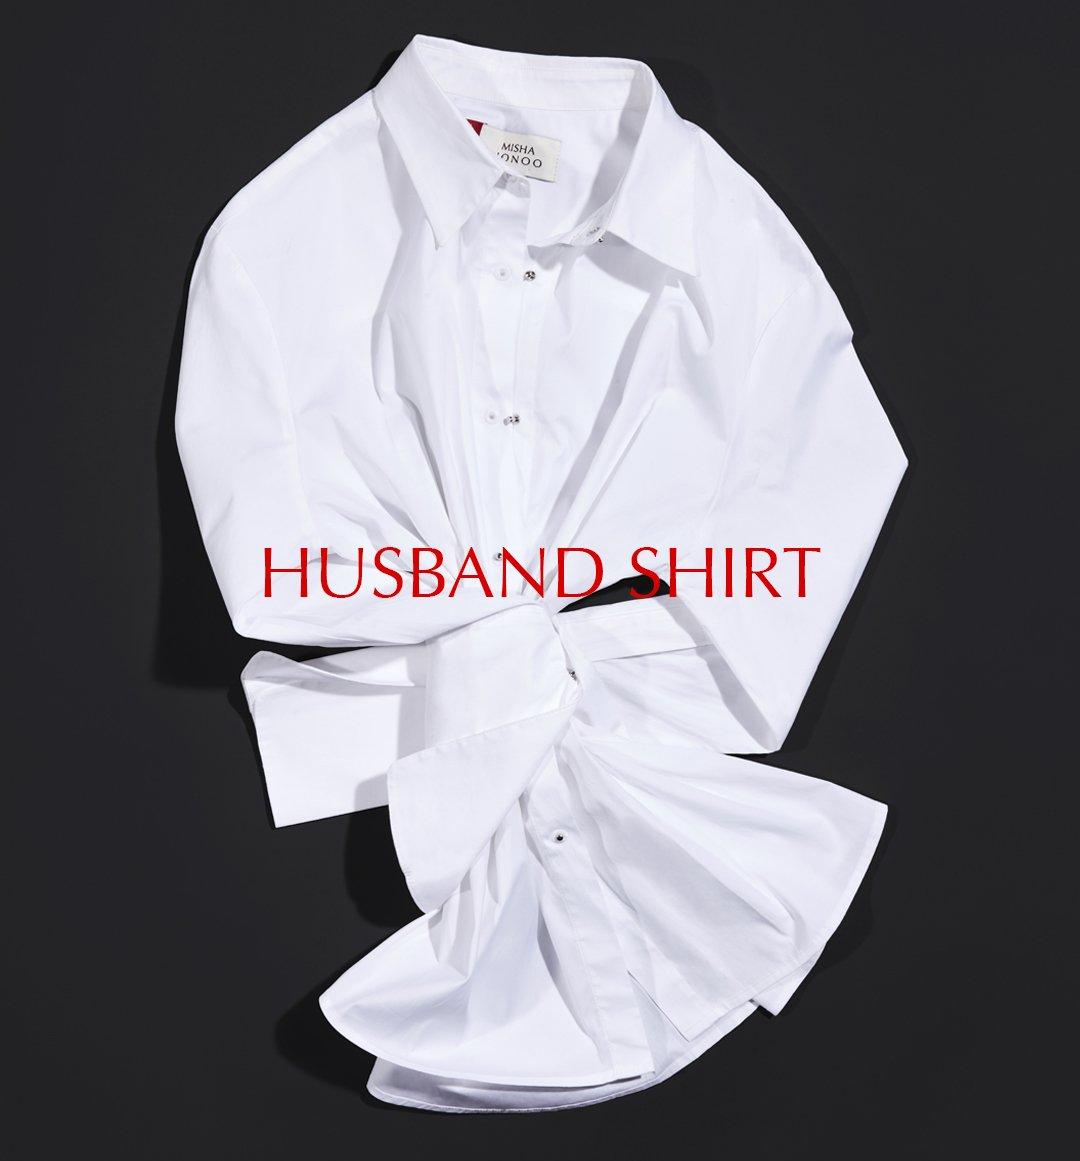 HUSBAND_SHIRT_HOMEPAGE_2.jpg